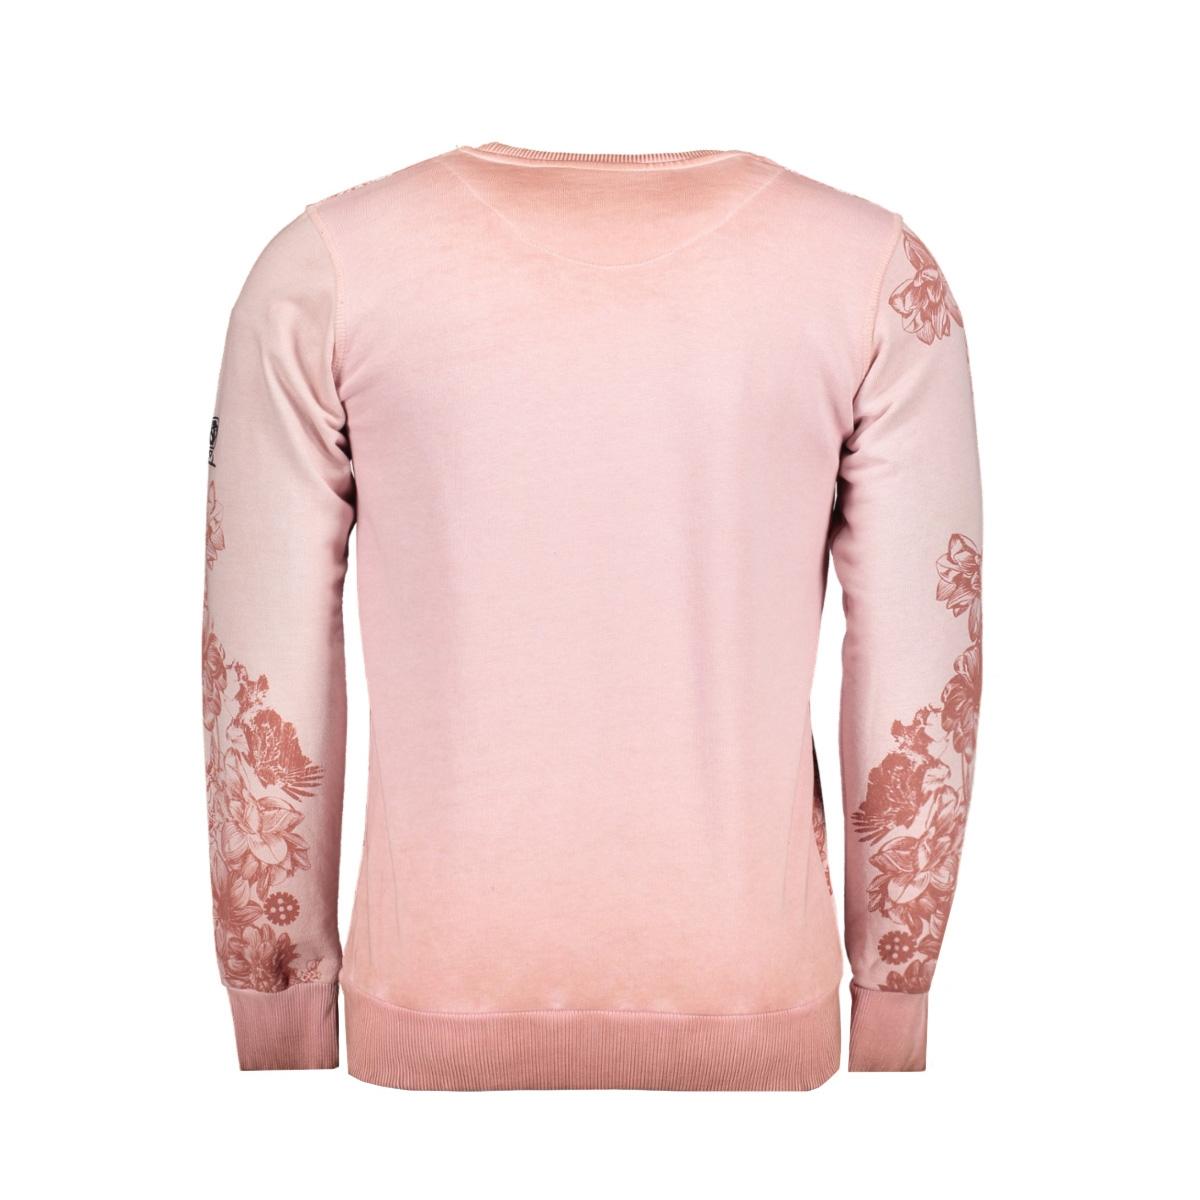 76129 gabbiano sweater pink